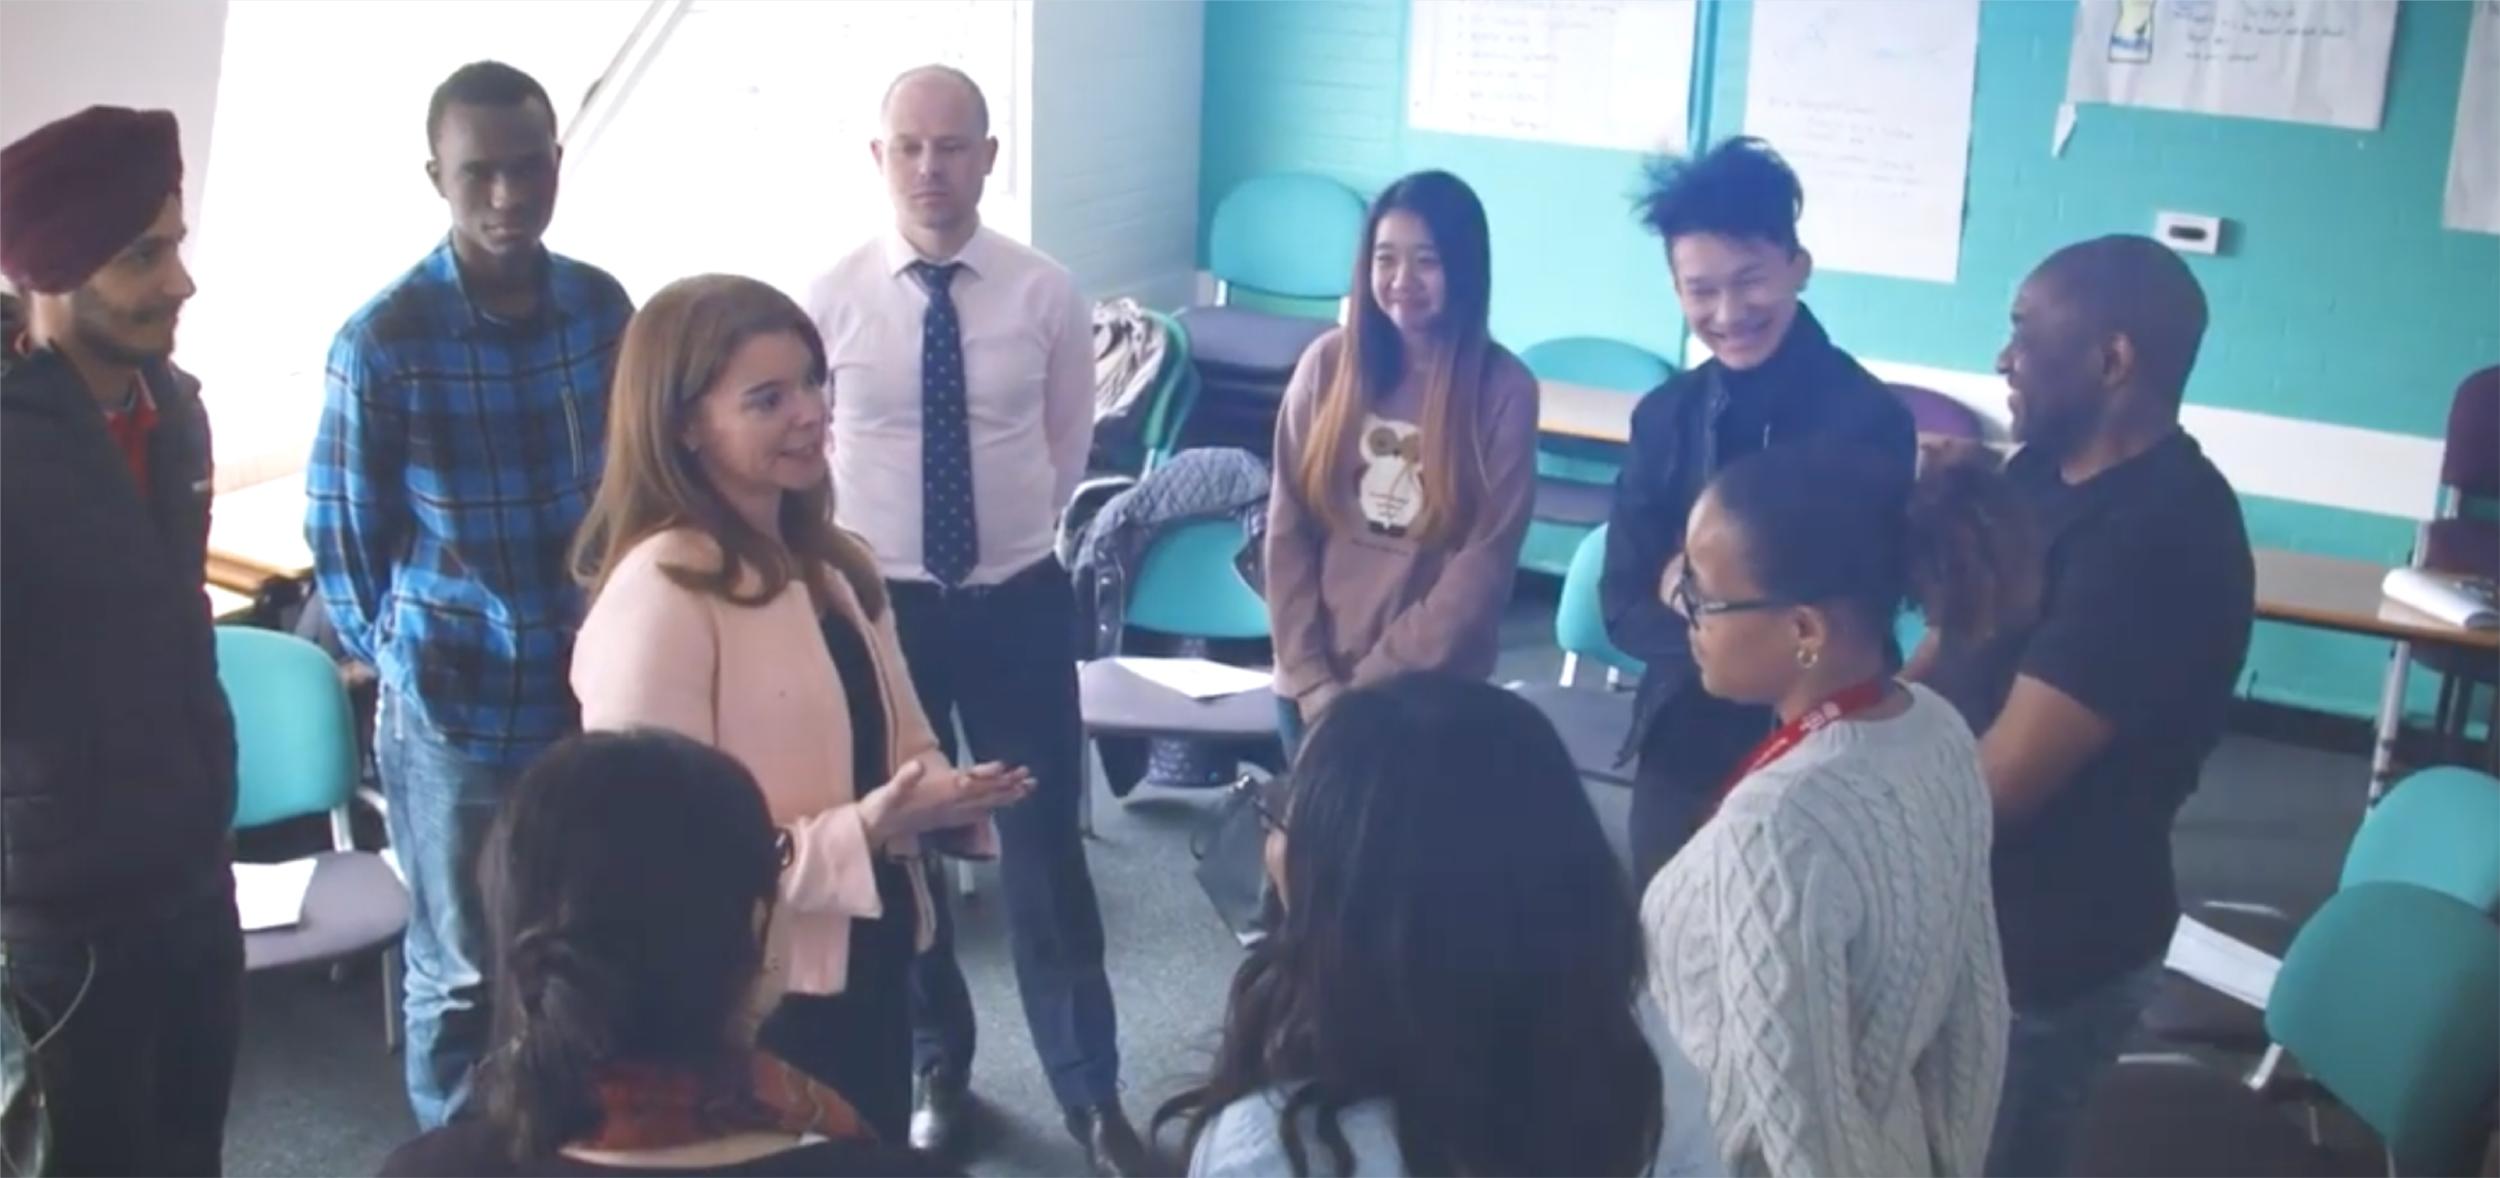 Graydin_Coaching_Courses_Schools_Educators_Teachers_Leaders_Administrators_Beginner_London_Toronto_NewYork_BEFacilitation-42.png